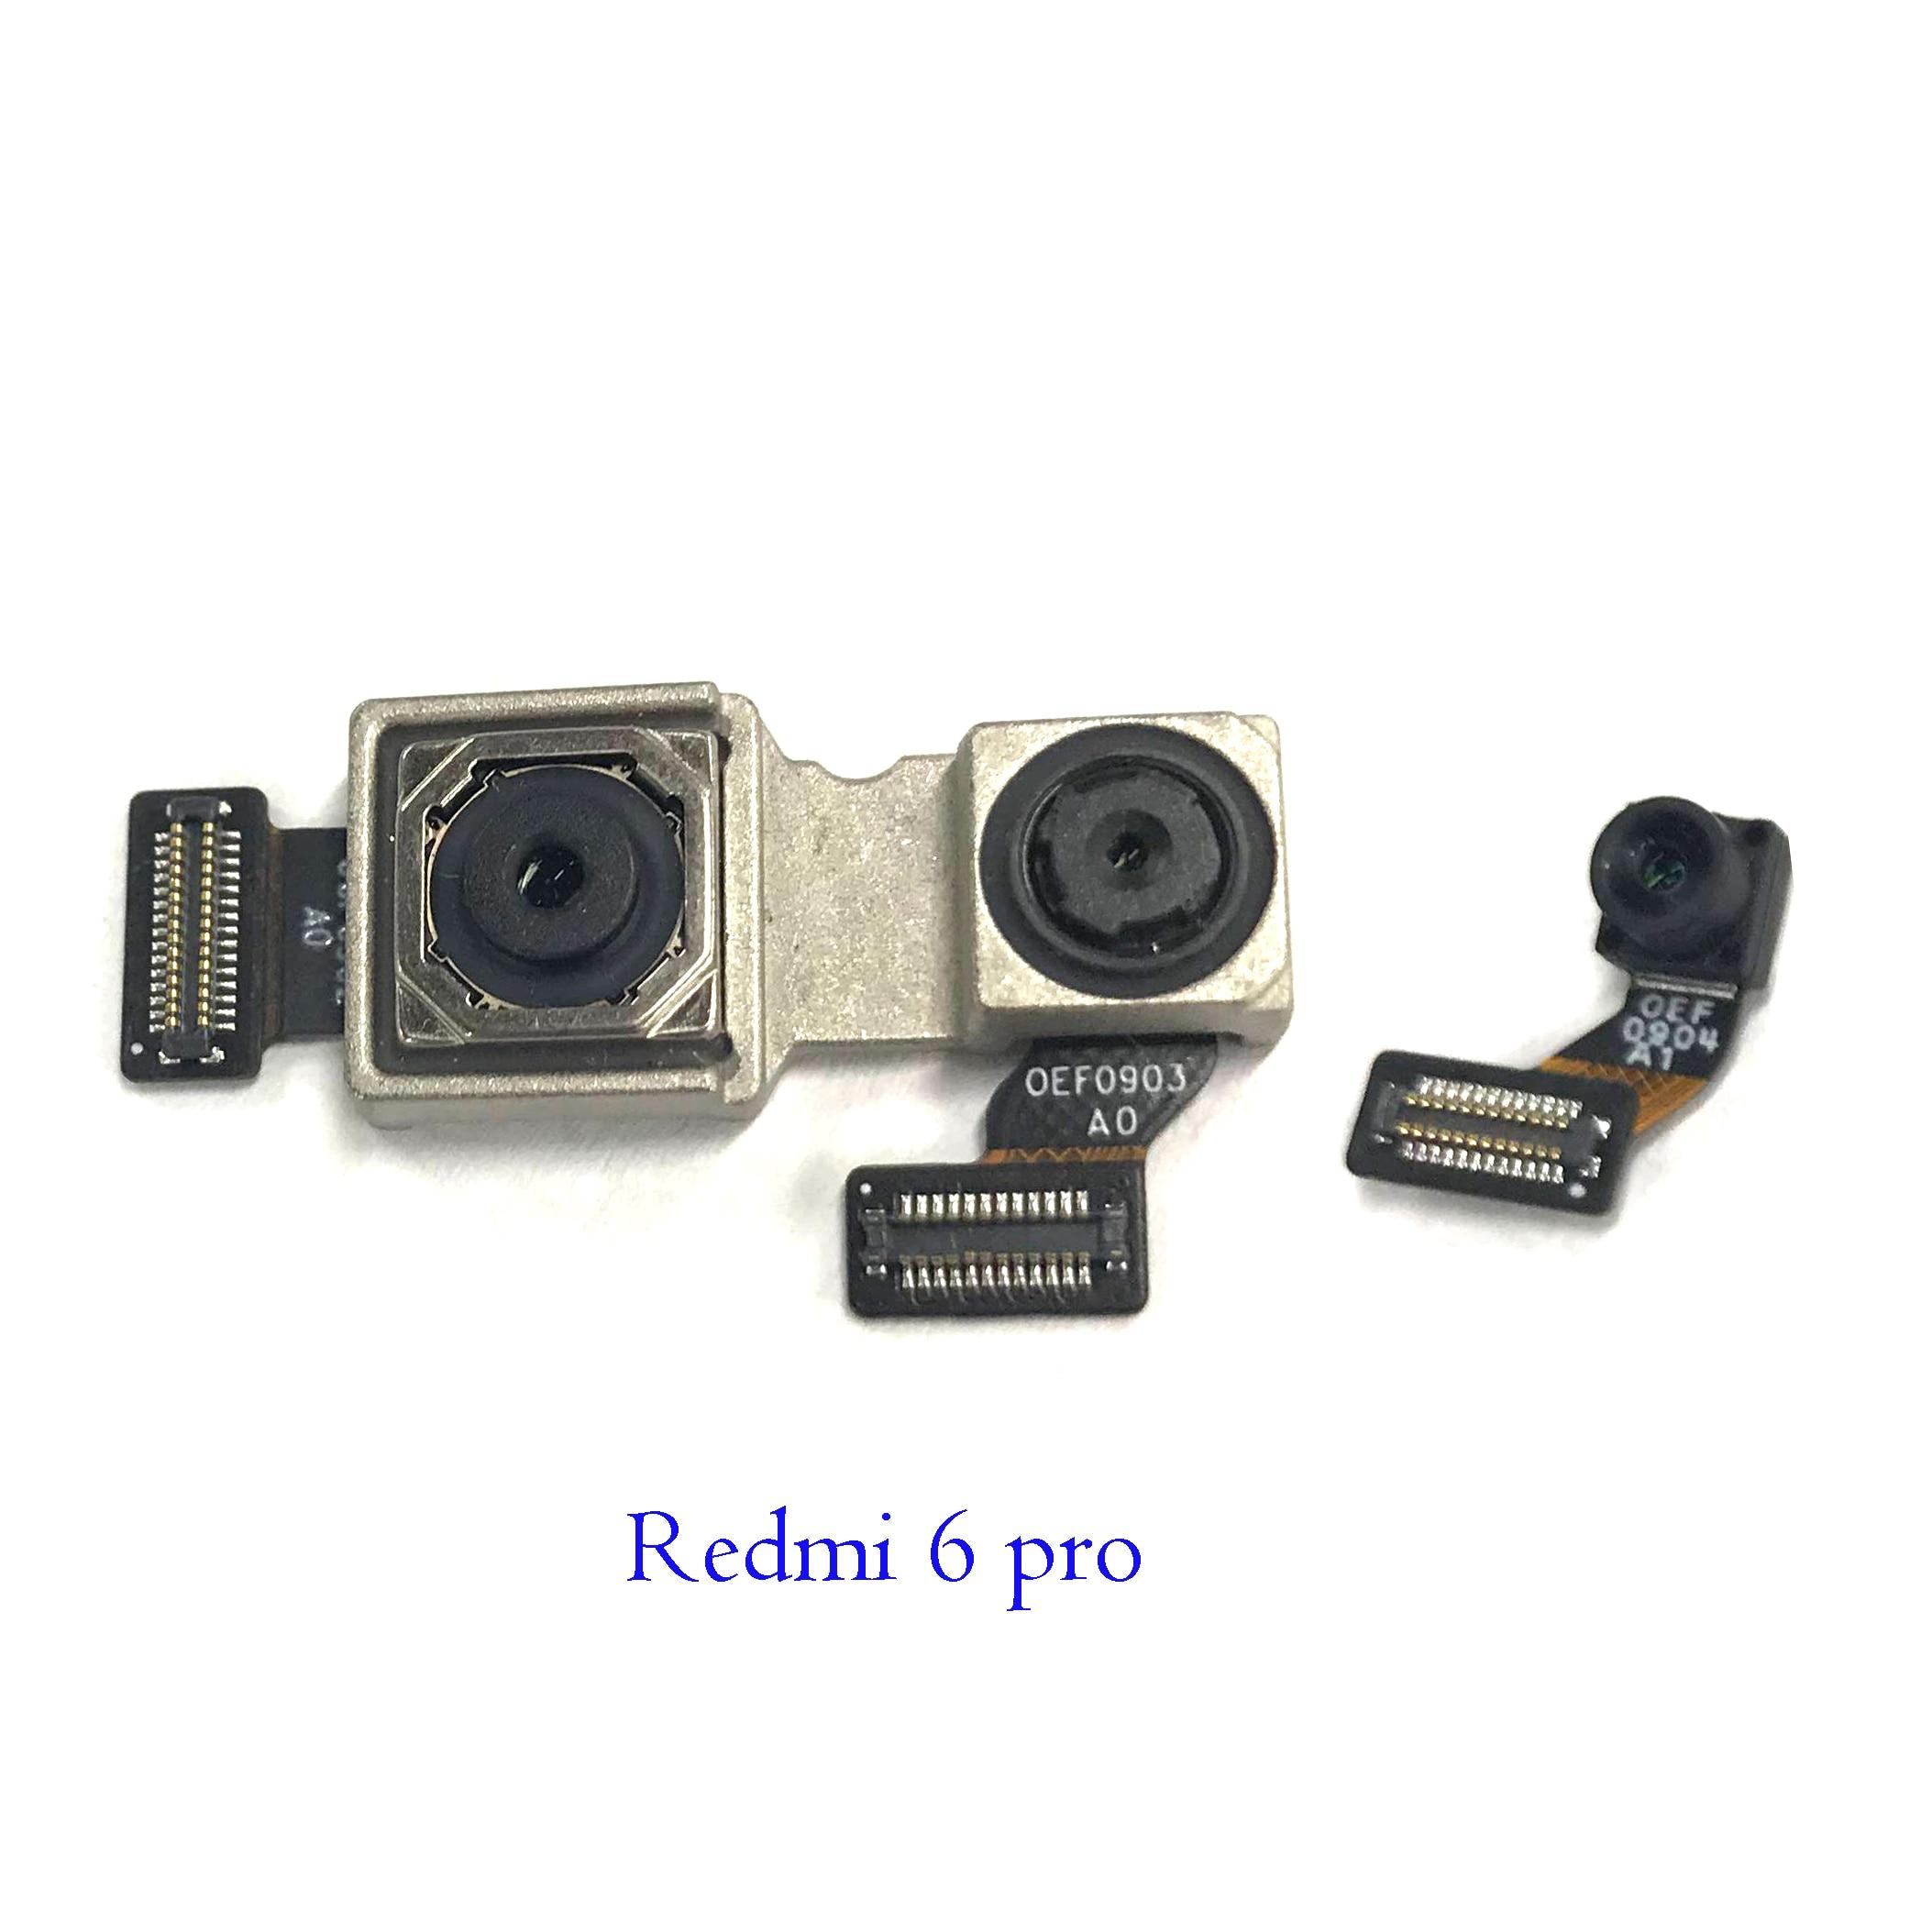 New Original Front Facing Camera Rear Back Main Camera For Xiaomi Redmi 6 Pro/Mi A2 Lite